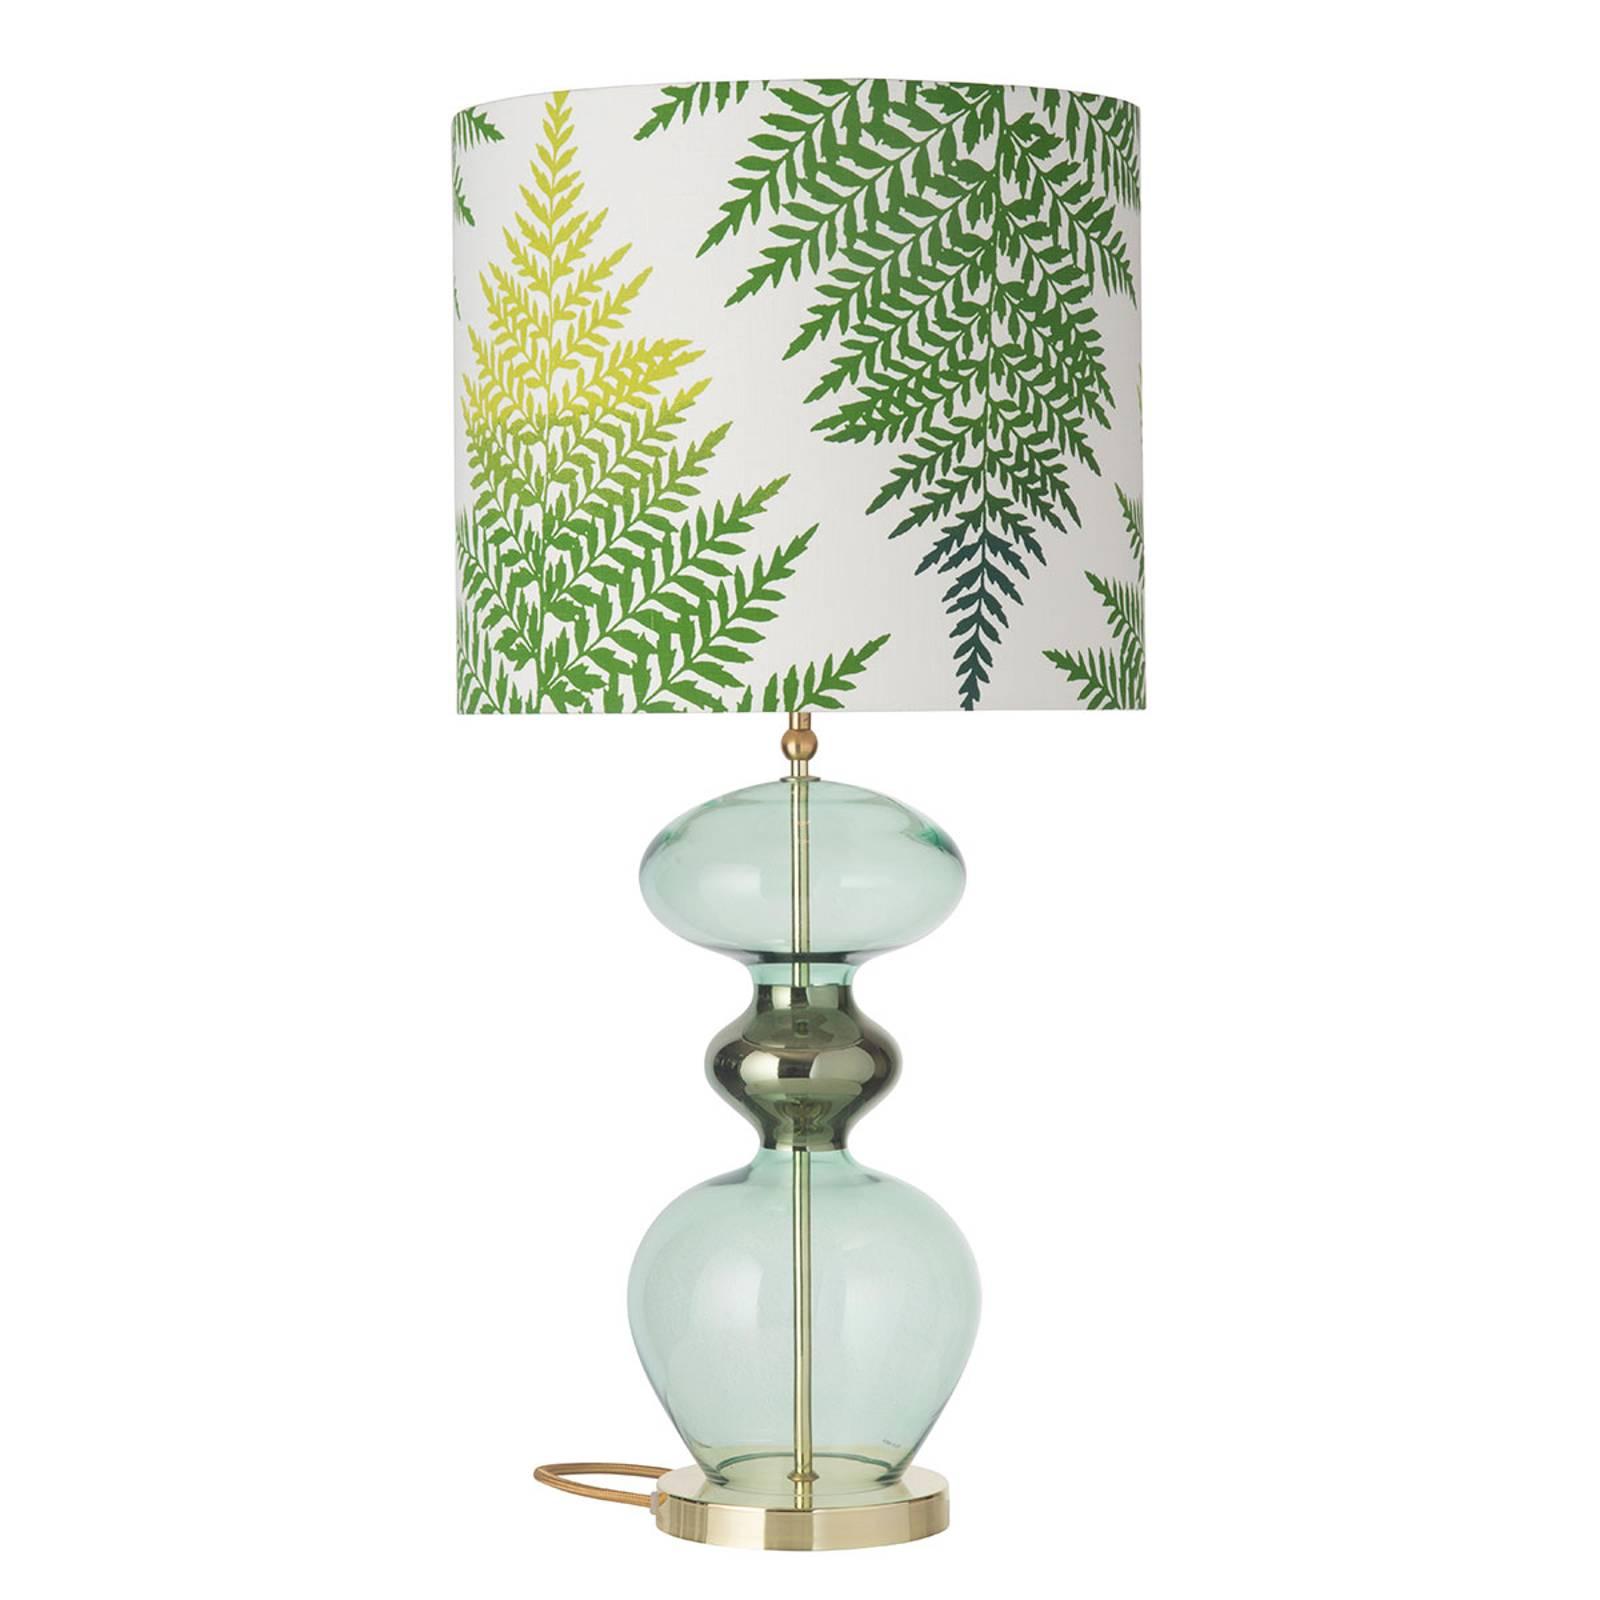 EBB & FLOW Futura lampe à poser, Fern Leaves vert